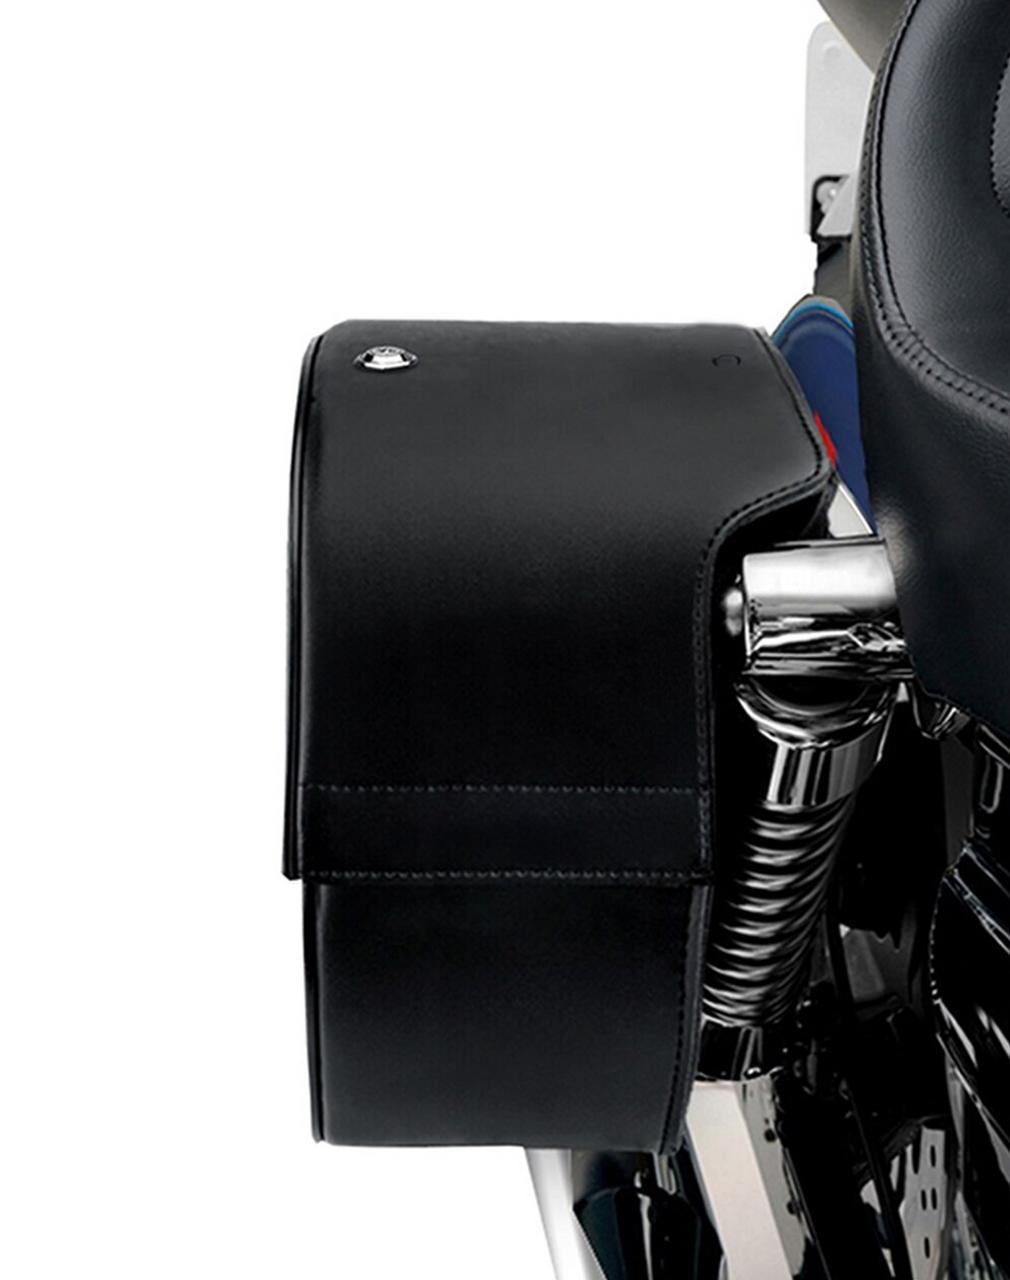 Viking Large Shock Cutout Warrior Slanted Motorcycle Saddlebags For Harley Sportster Iron 1200 Shock cutout view